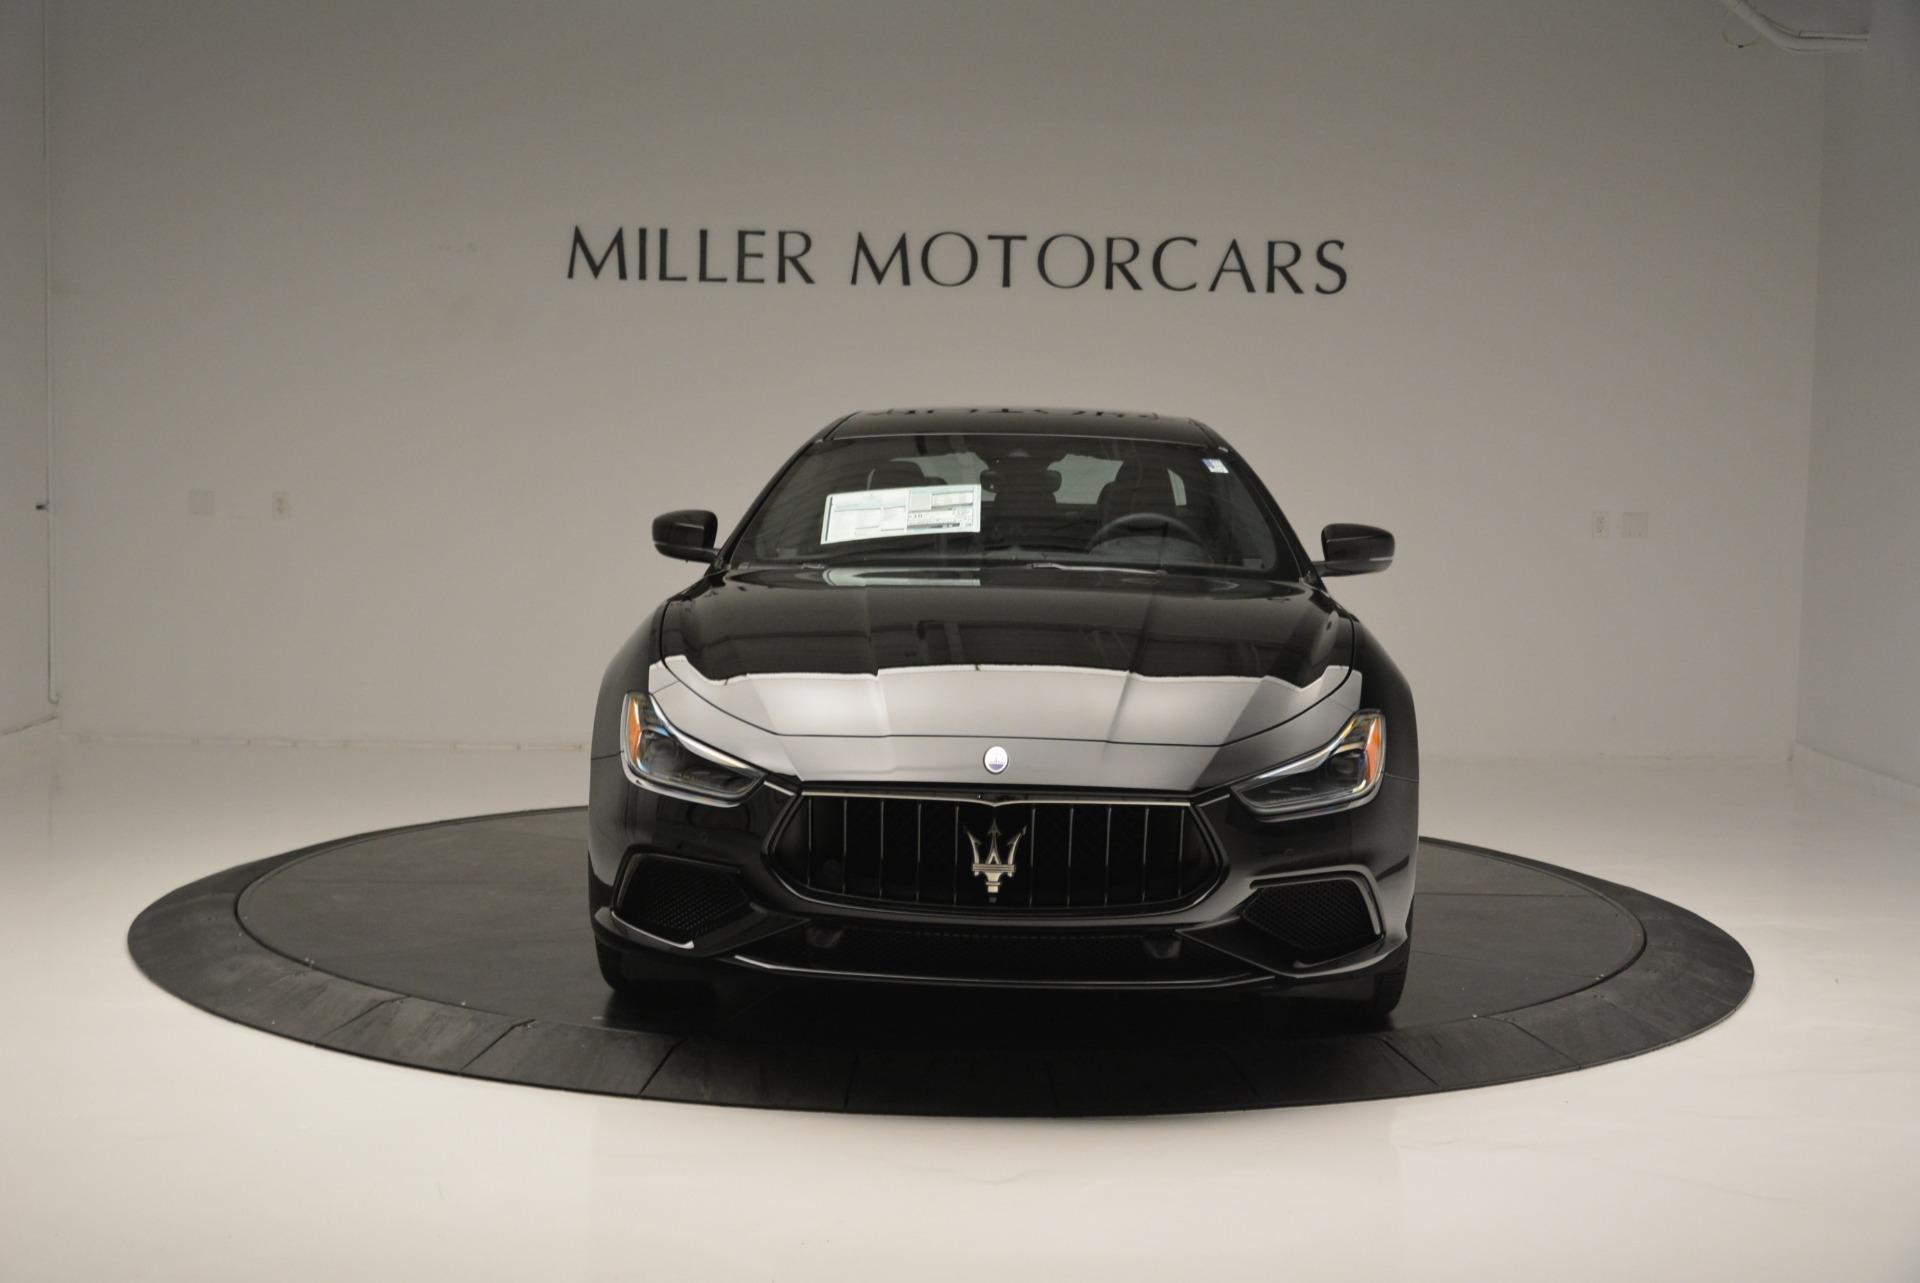 New 2018 Maserati Ghibli SQ4 GranSport Nerissimo For Sale In Westport, CT 2278_p12